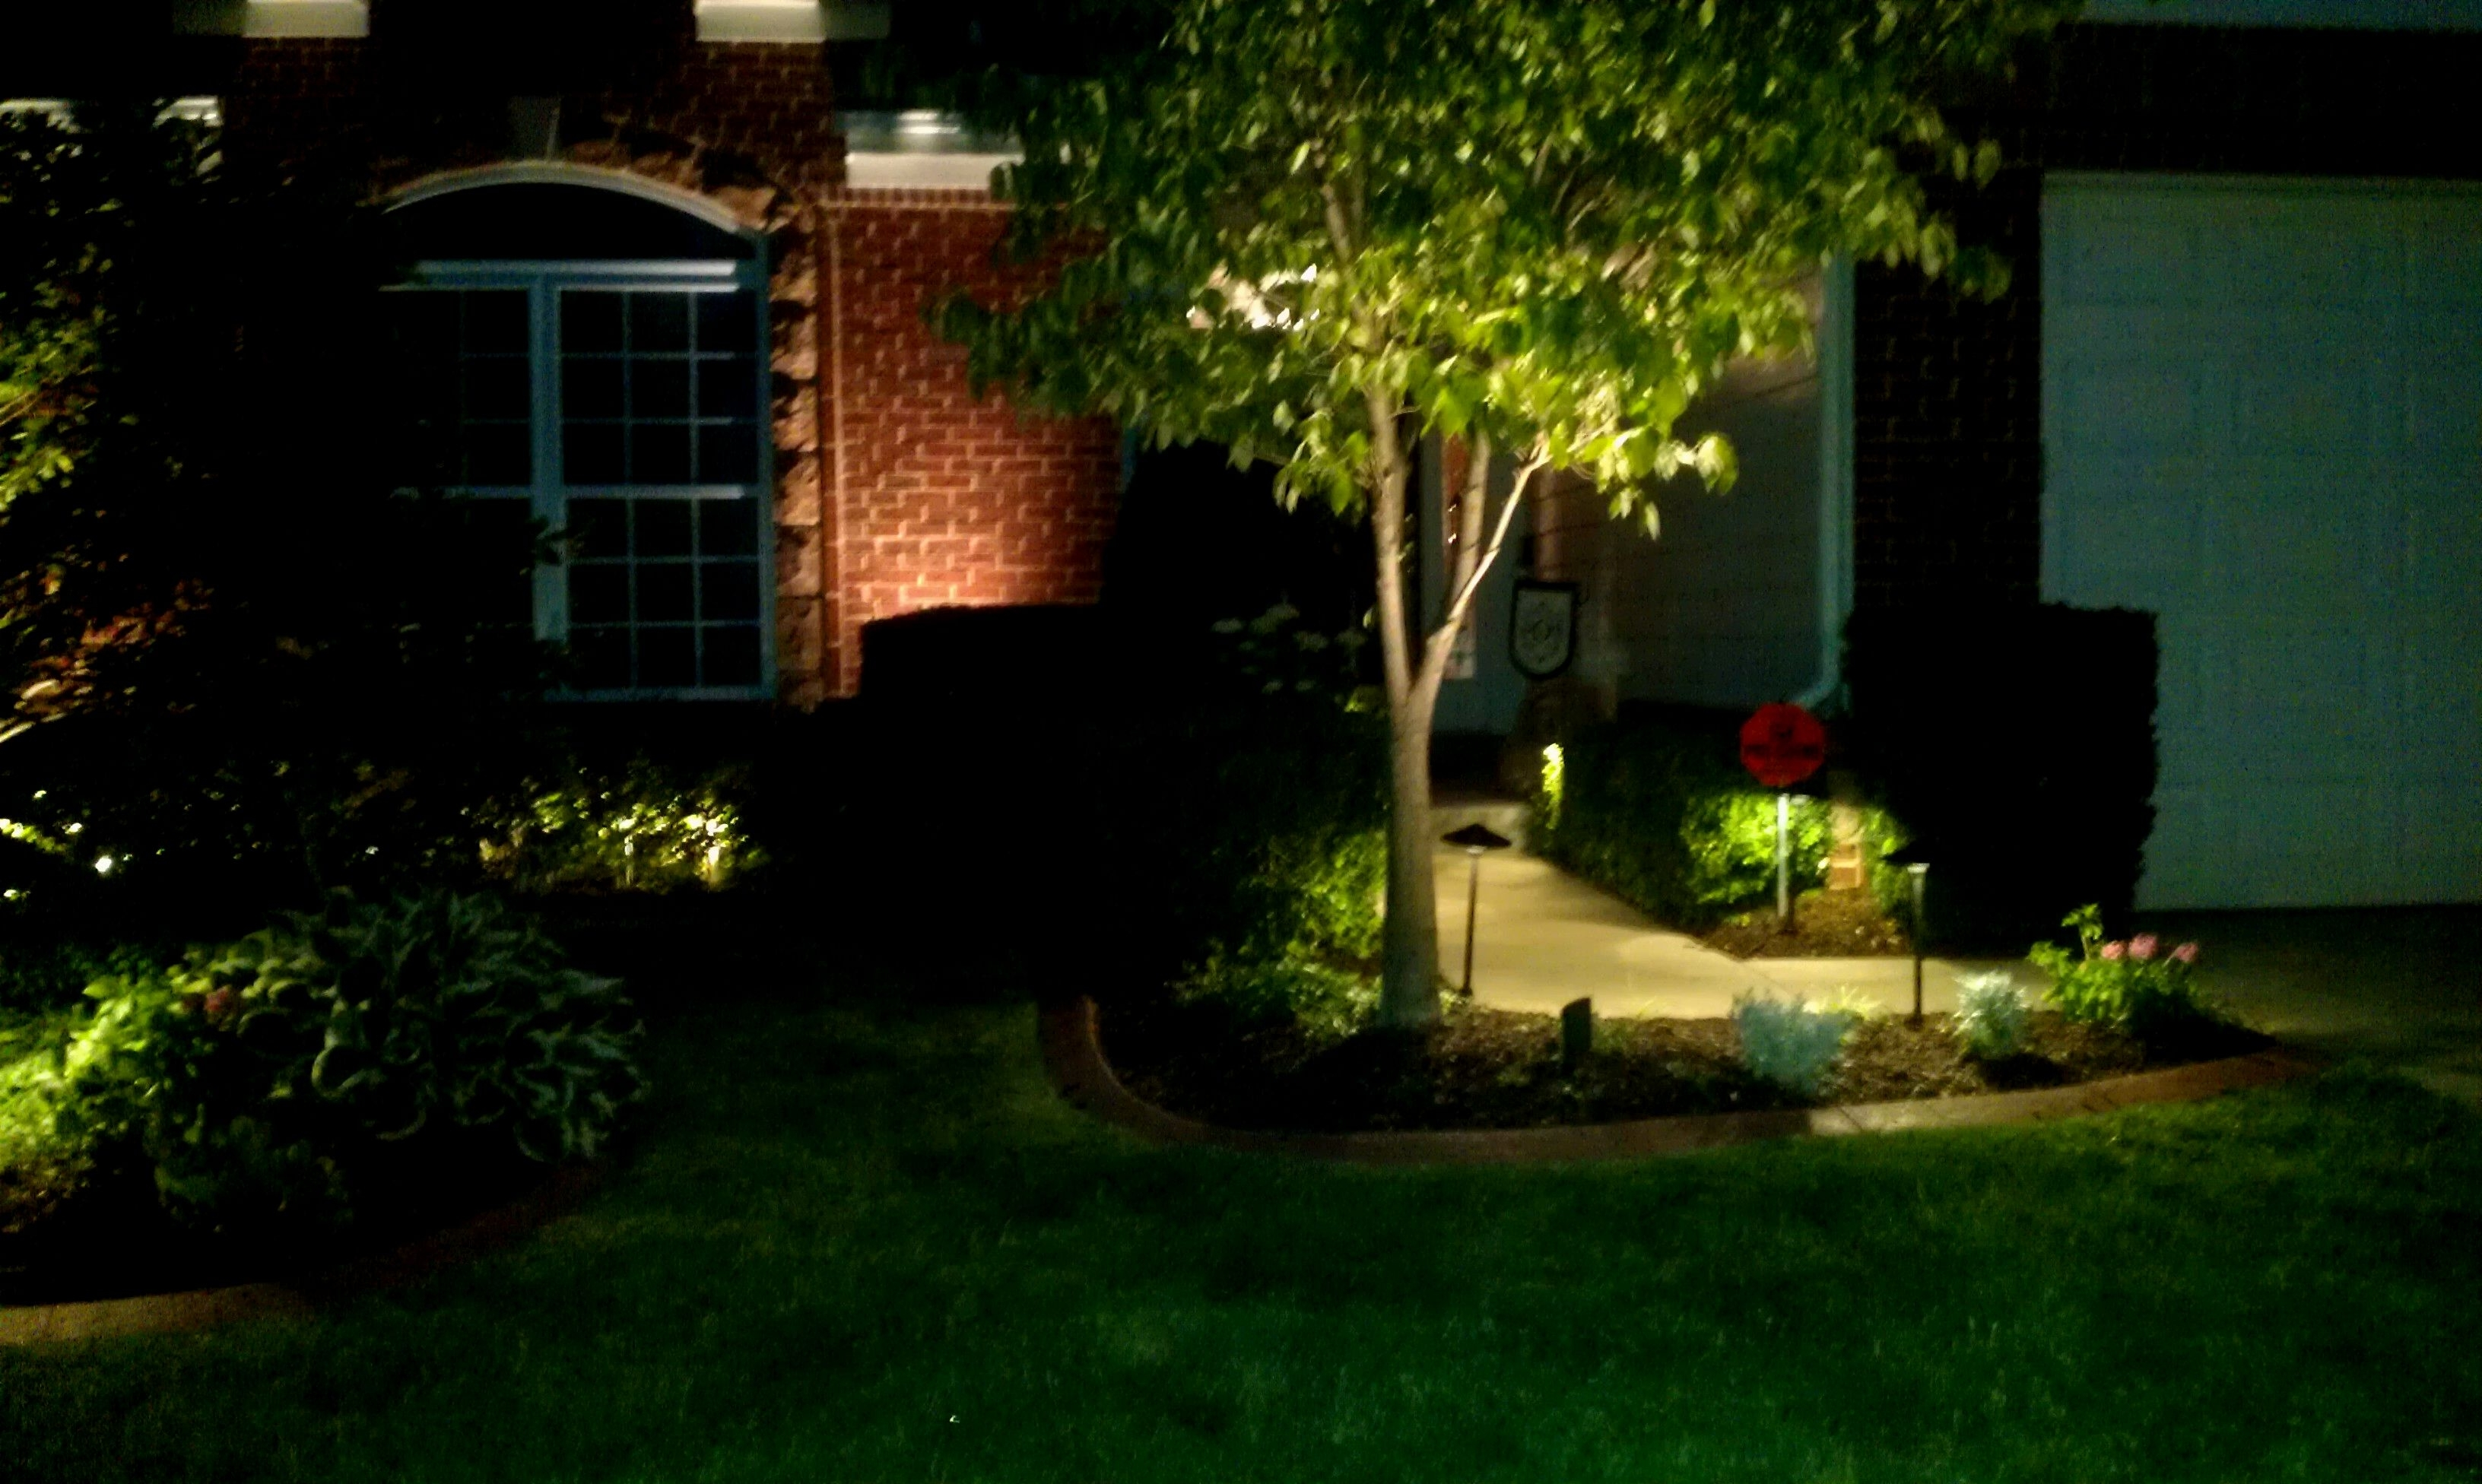 Lamp: Efficient Lighting Solution With Hampton Bay Low Voltage Regarding Lowes Outdoor Landscape Lighting (#2 of 15)